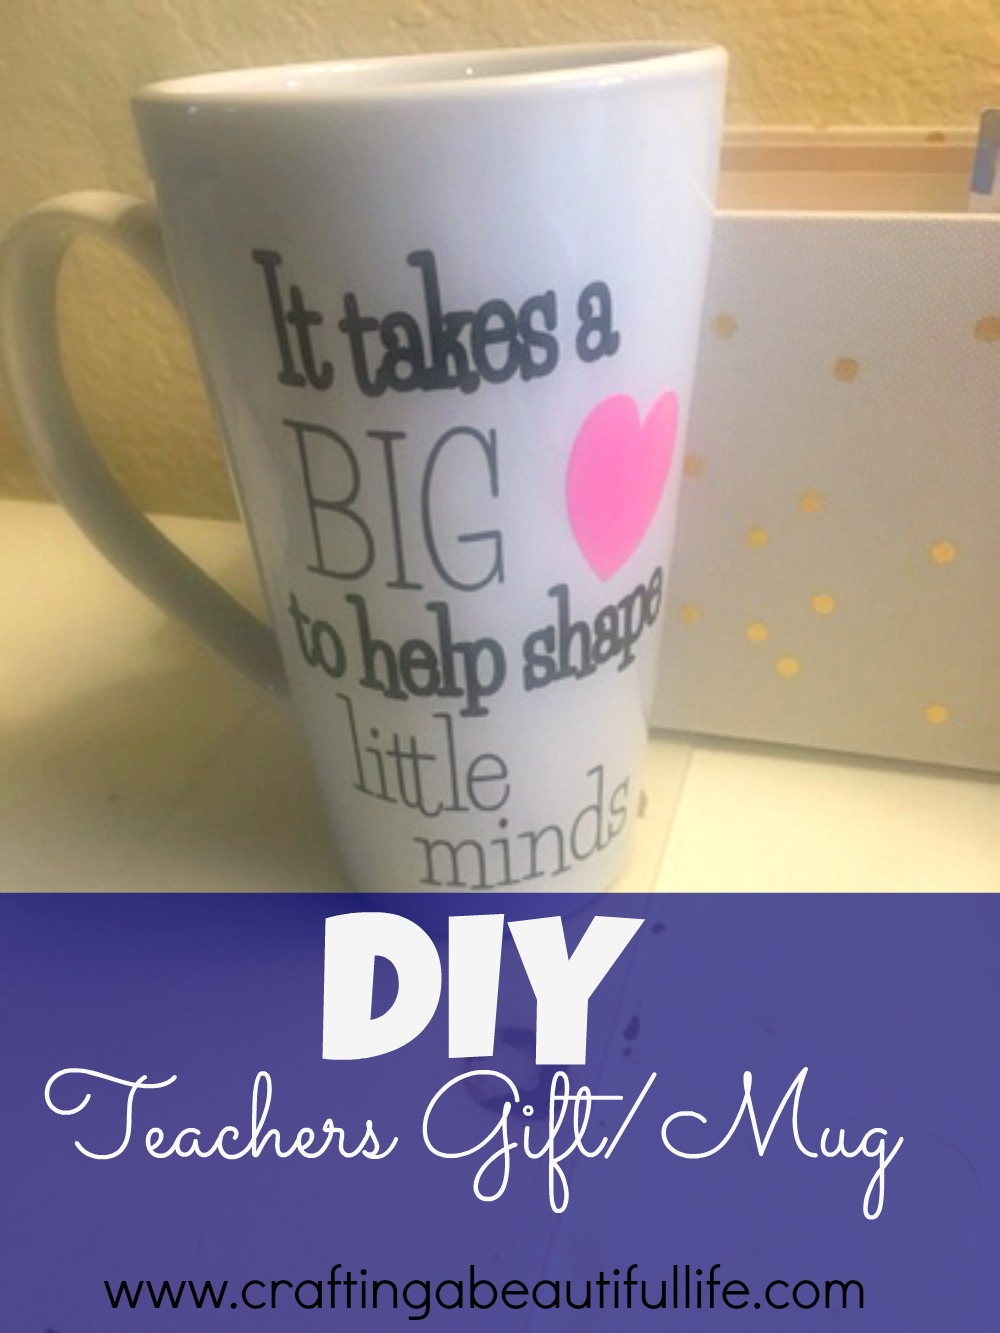 School is in Session + DIY Glitter Mugs